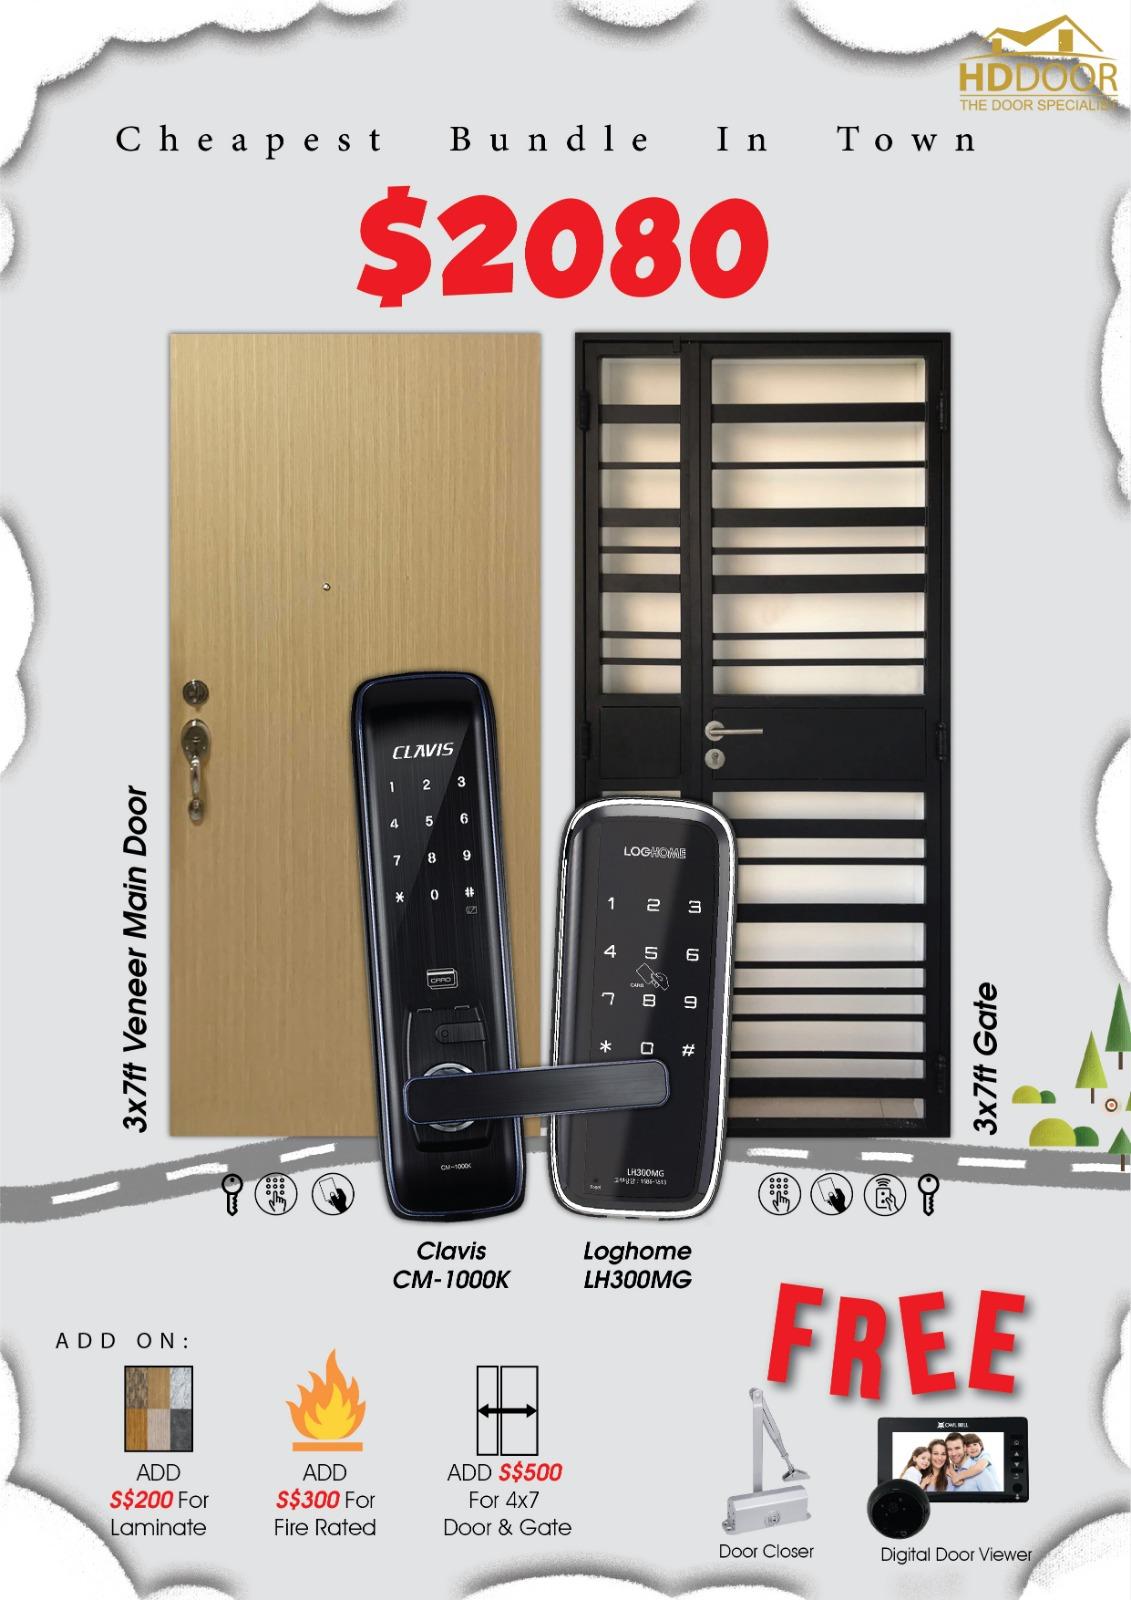 Cheapest Bundle Promotion 2020 | Why Not Deals & Promotions